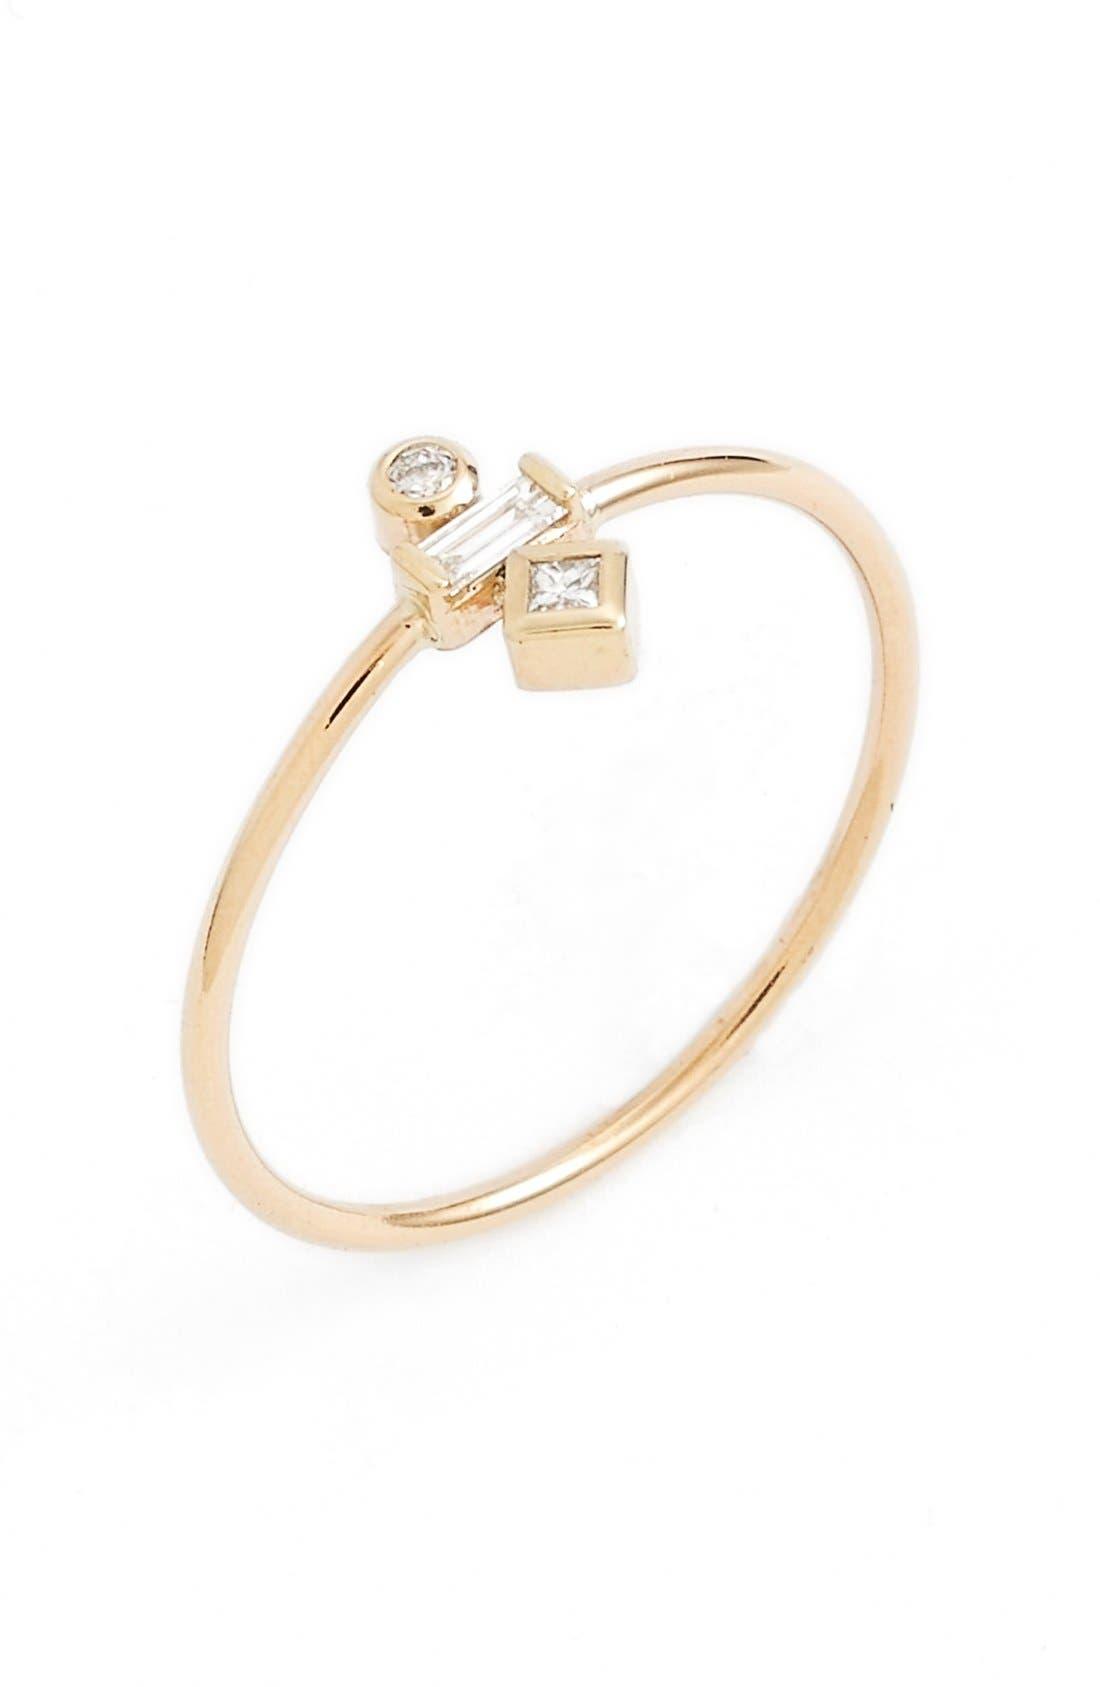 Main Image - Zoë Chicco Mixed Diamond Stack Ring